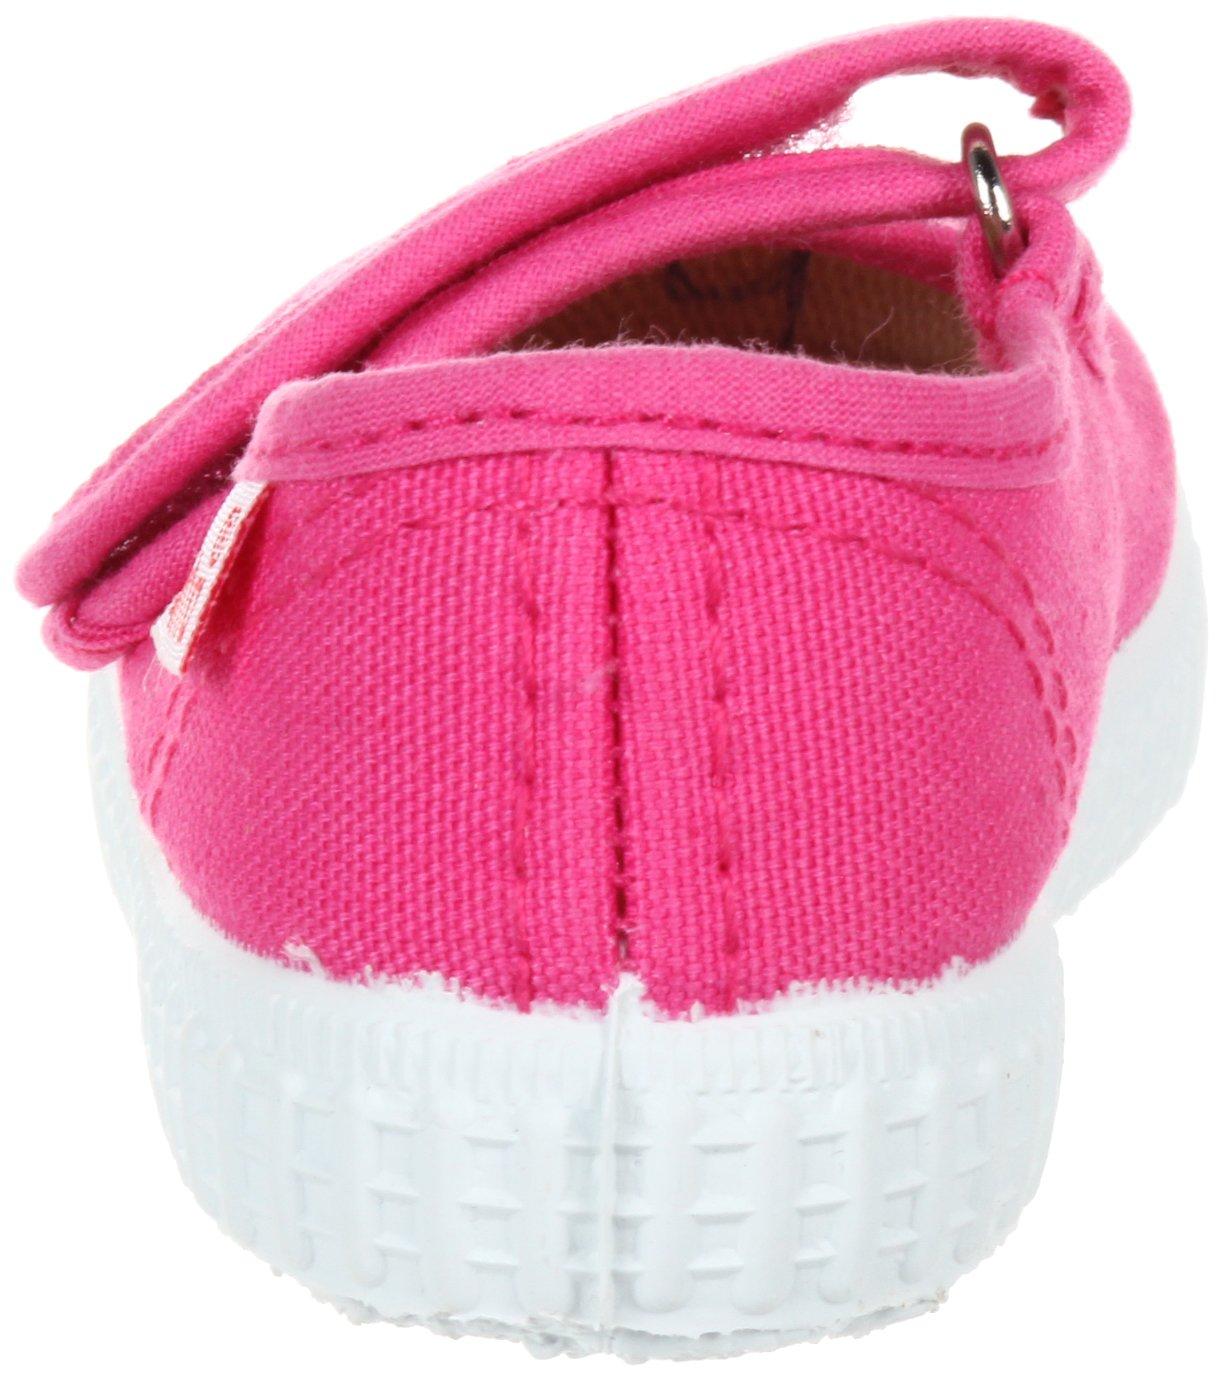 Cienta Girls Mary Jane Shoe, Fuchsia, 19 M EU / 3.5 M US Toddler by Cienta (Image #2)